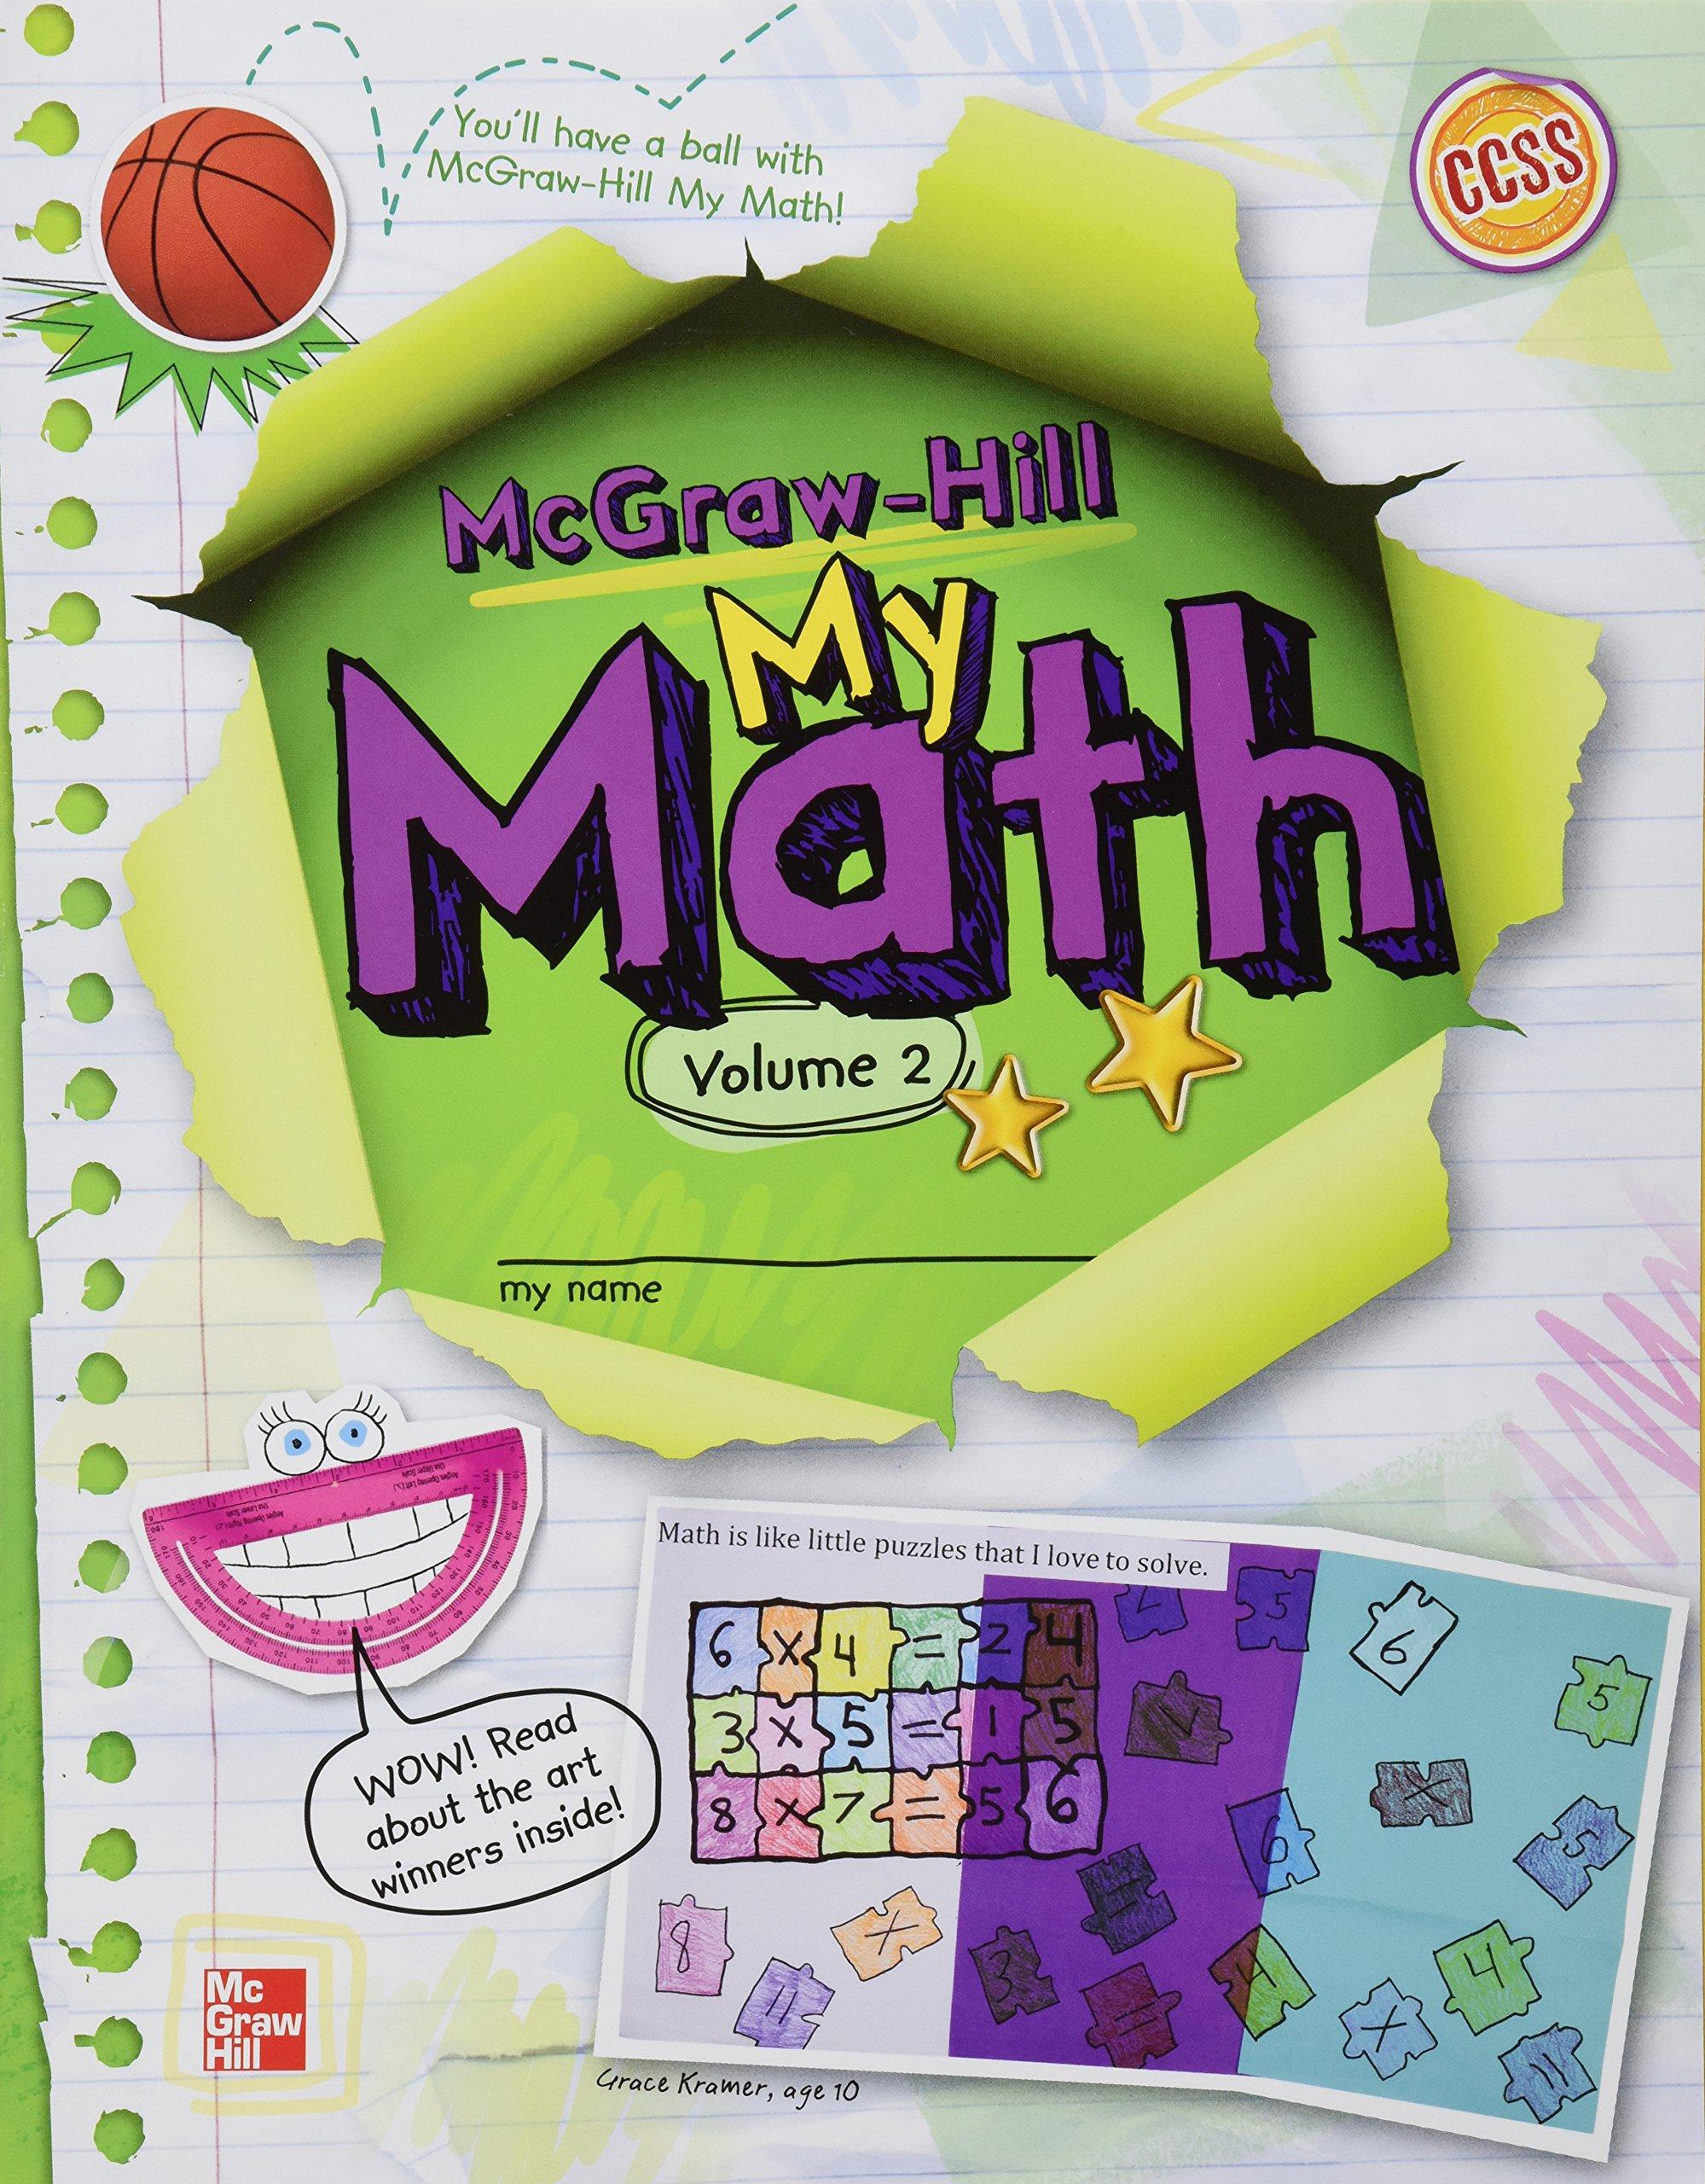 Life Science Textbook 7th Grade Mcgraw Hill Pdf